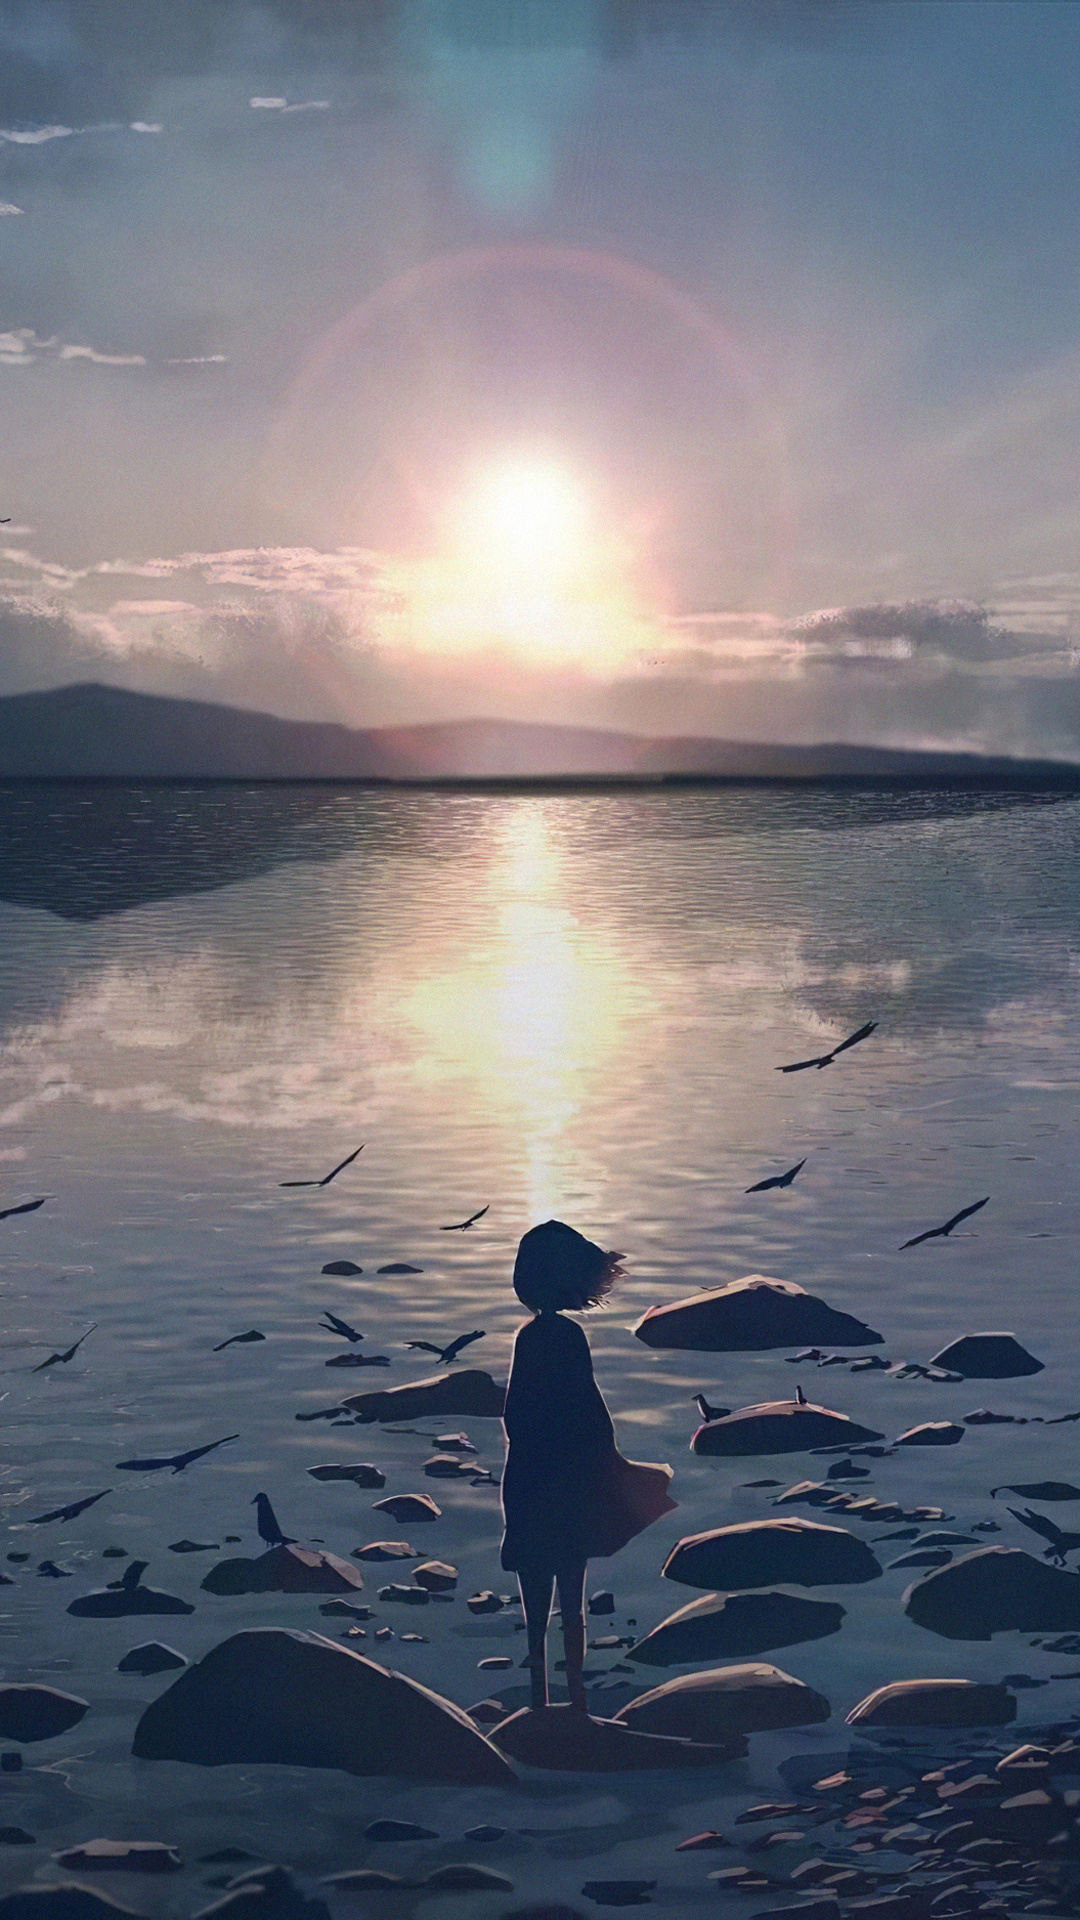 anime-moescape-alone-4k-mq.jpg